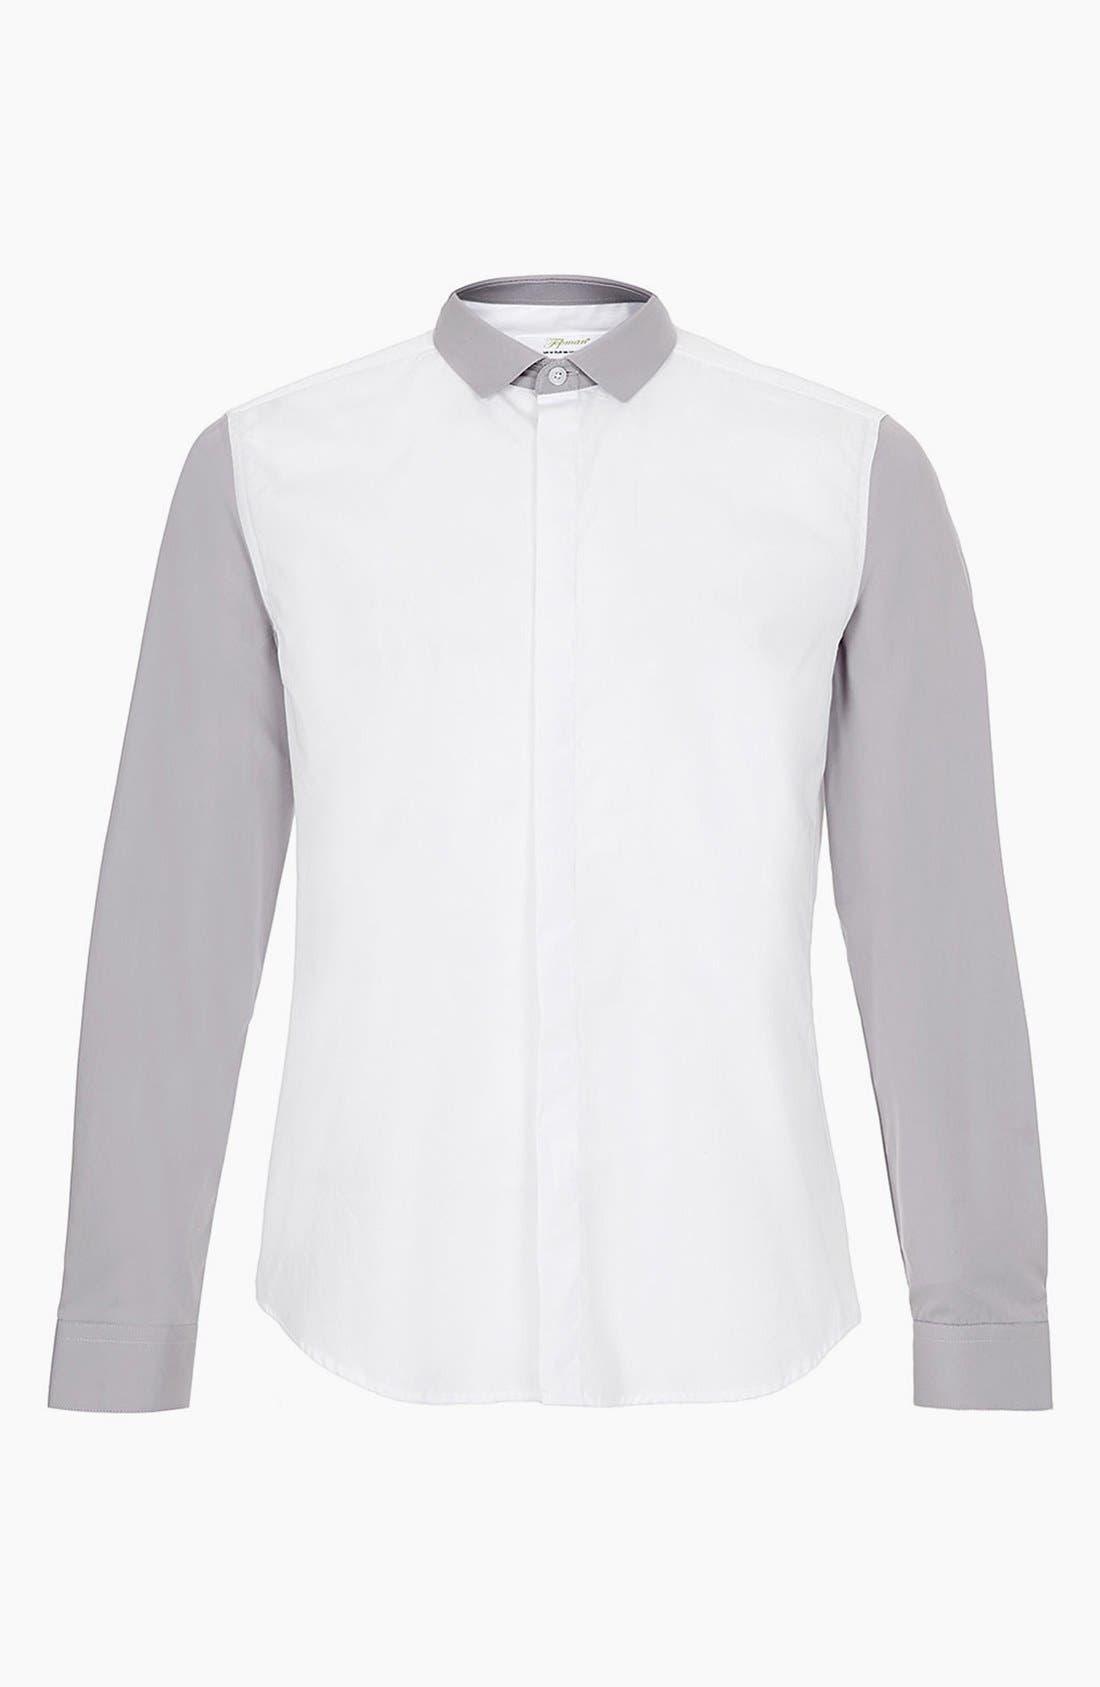 Main Image - Topman 'Smart' Extra Trim Contrast Dress Shirt